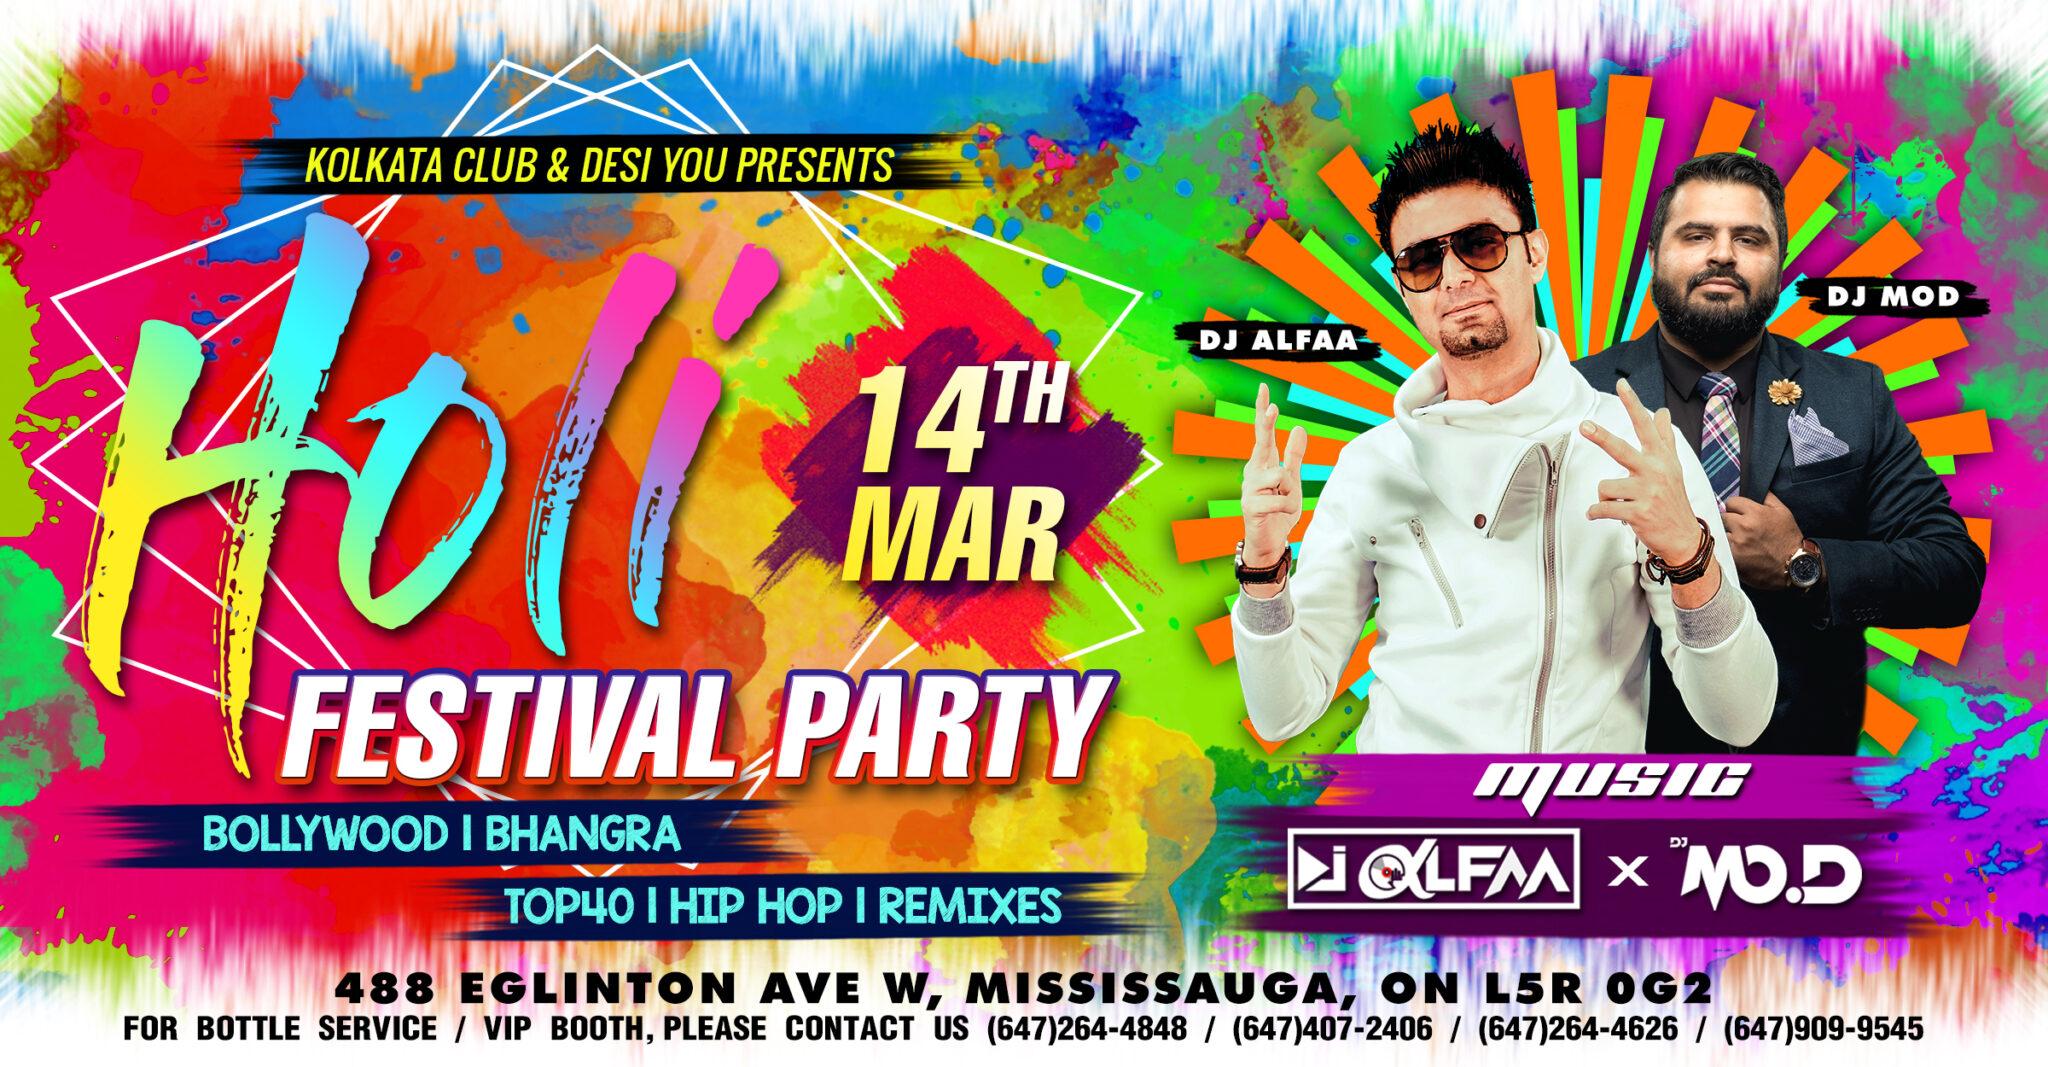 Holi Festival Party in Mississauga Toronto Kolkata Club with DJ Alfaa